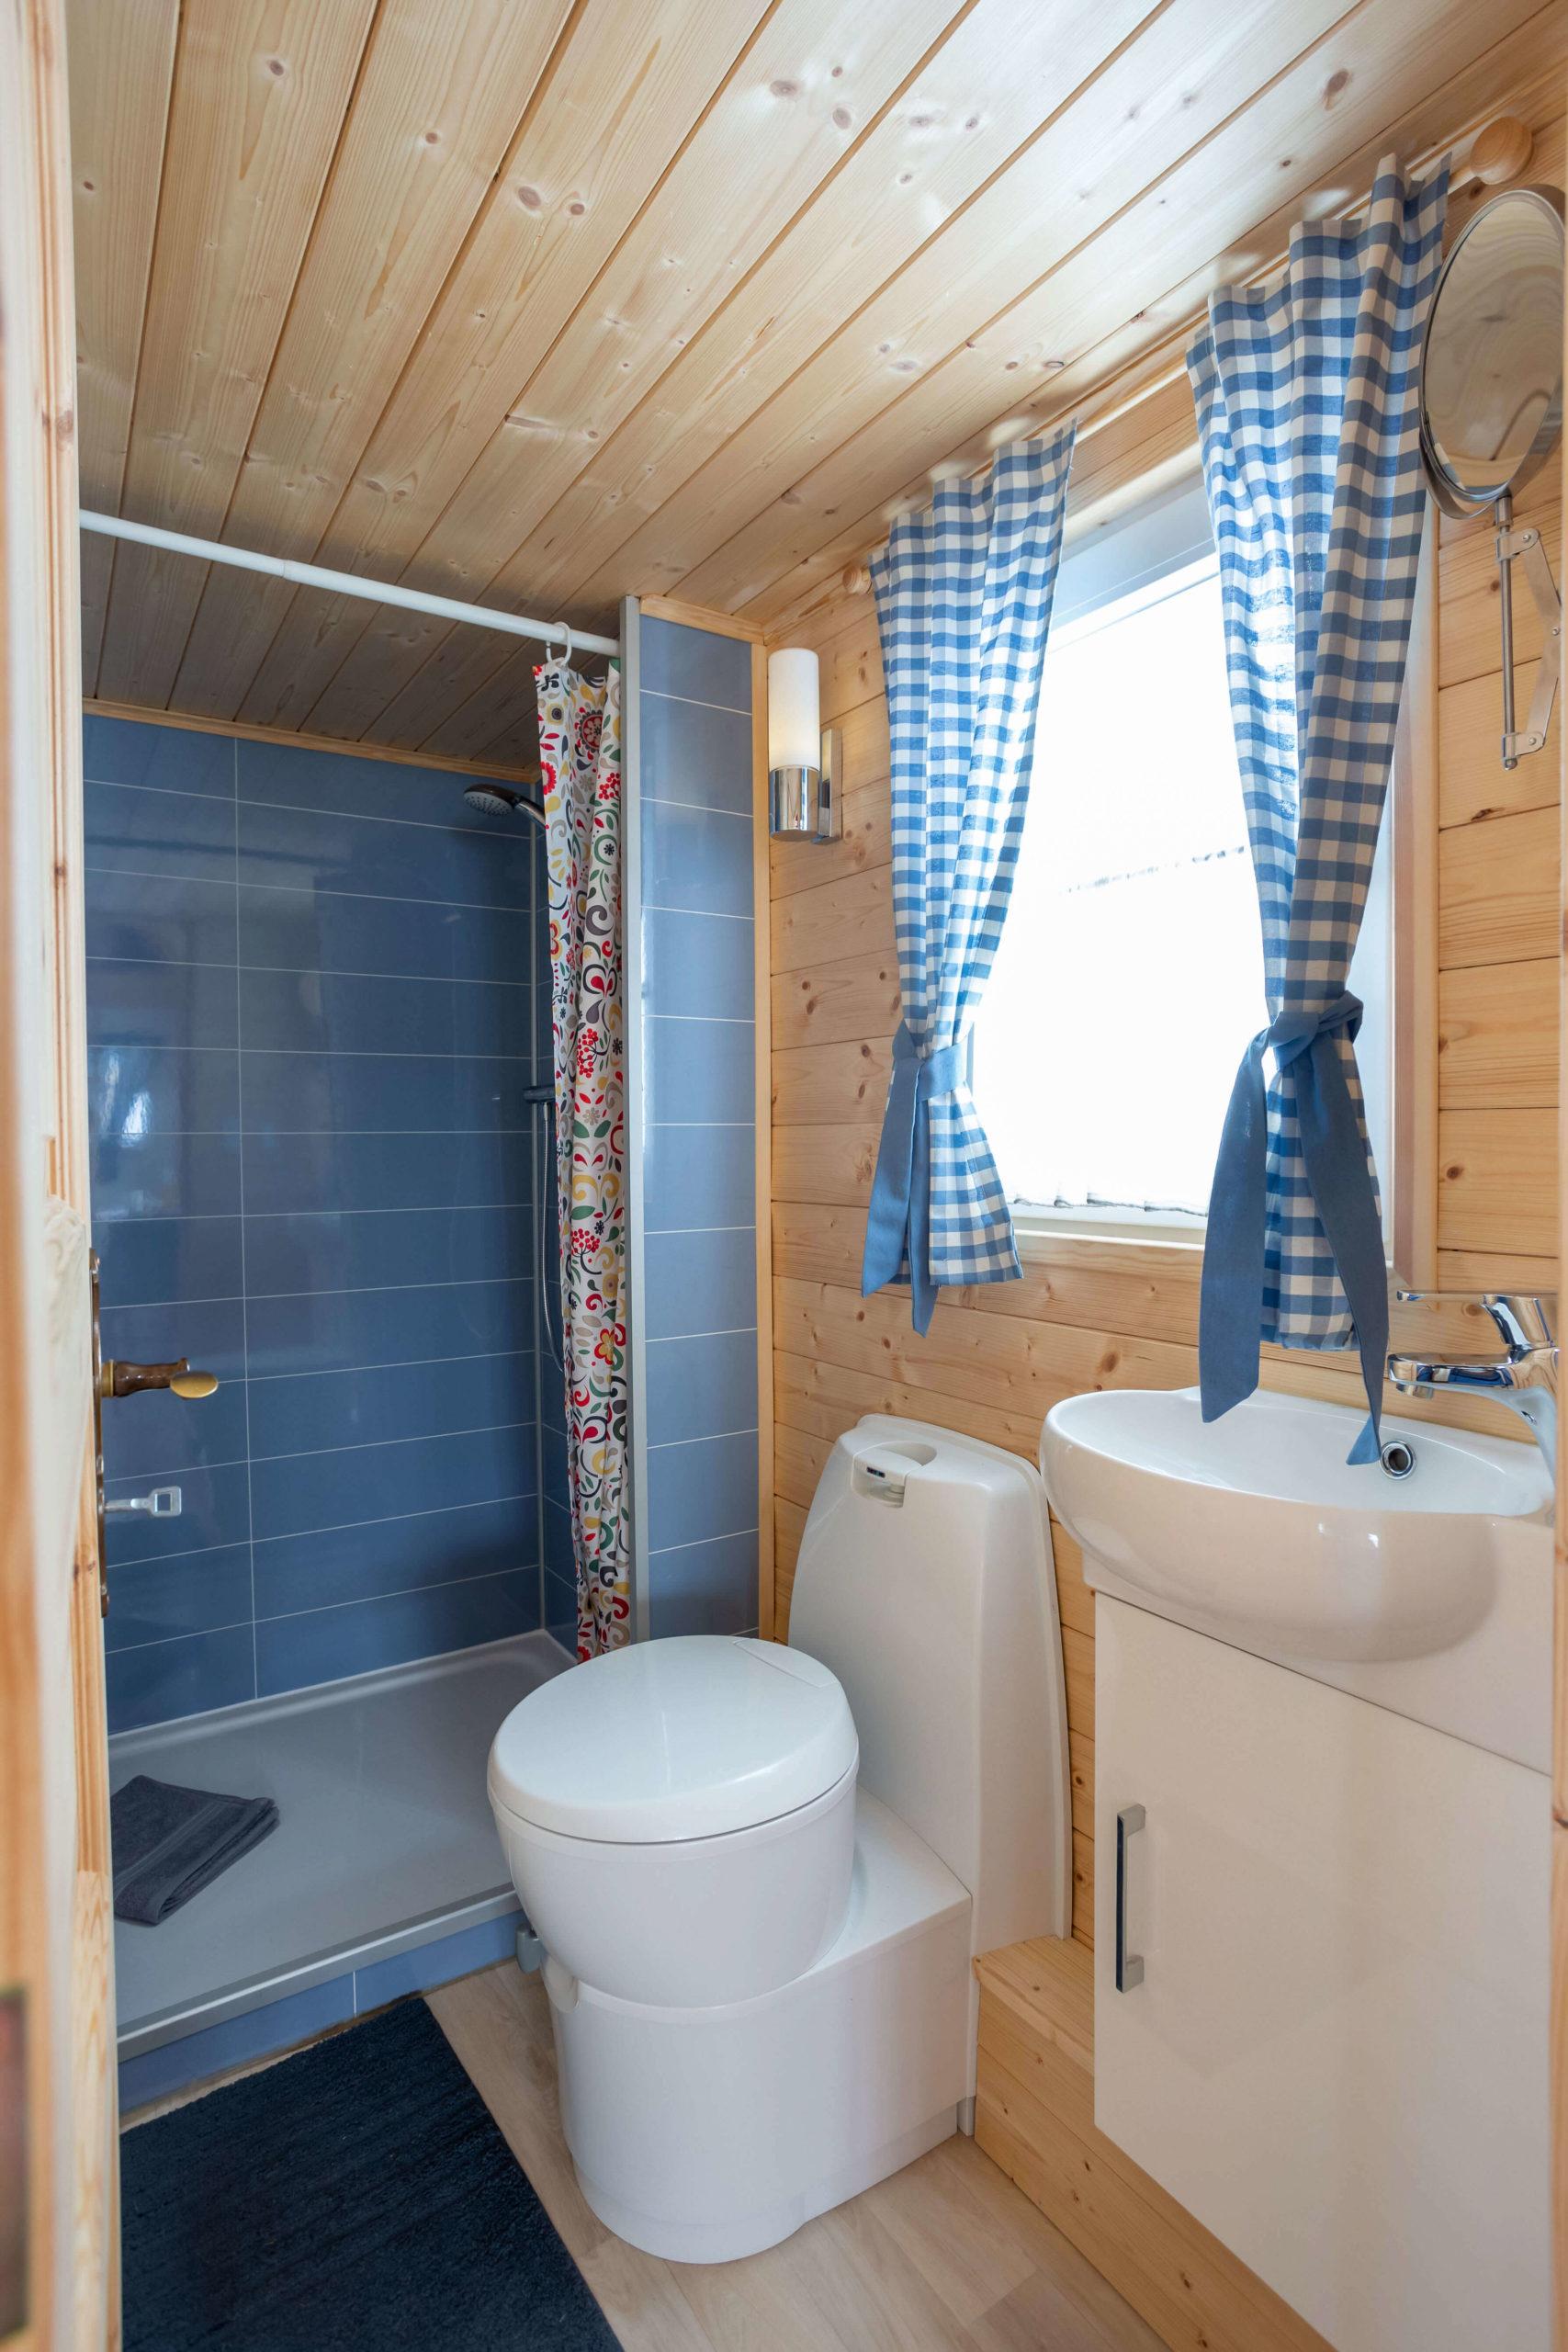 mobiles-tiny-house-island-vital-camp-gmbh-37